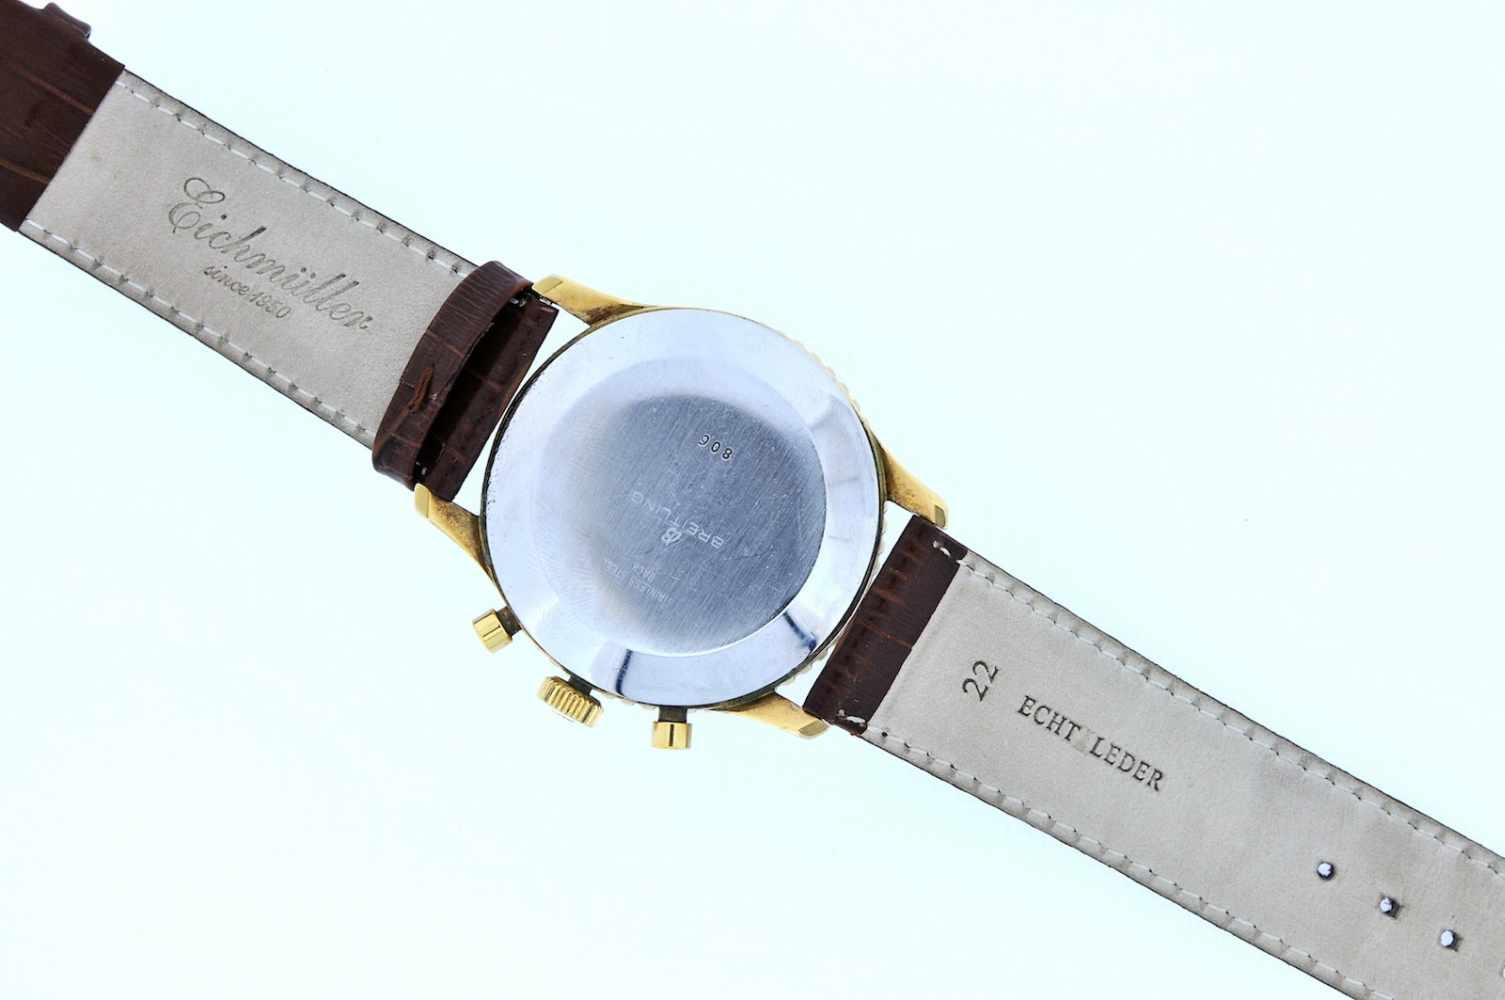 Breitling Stahl vergoldete Armbanduhr an Lederband, Breitling Navitimer, Fliegerchronograph, - Bild 4 aus 5